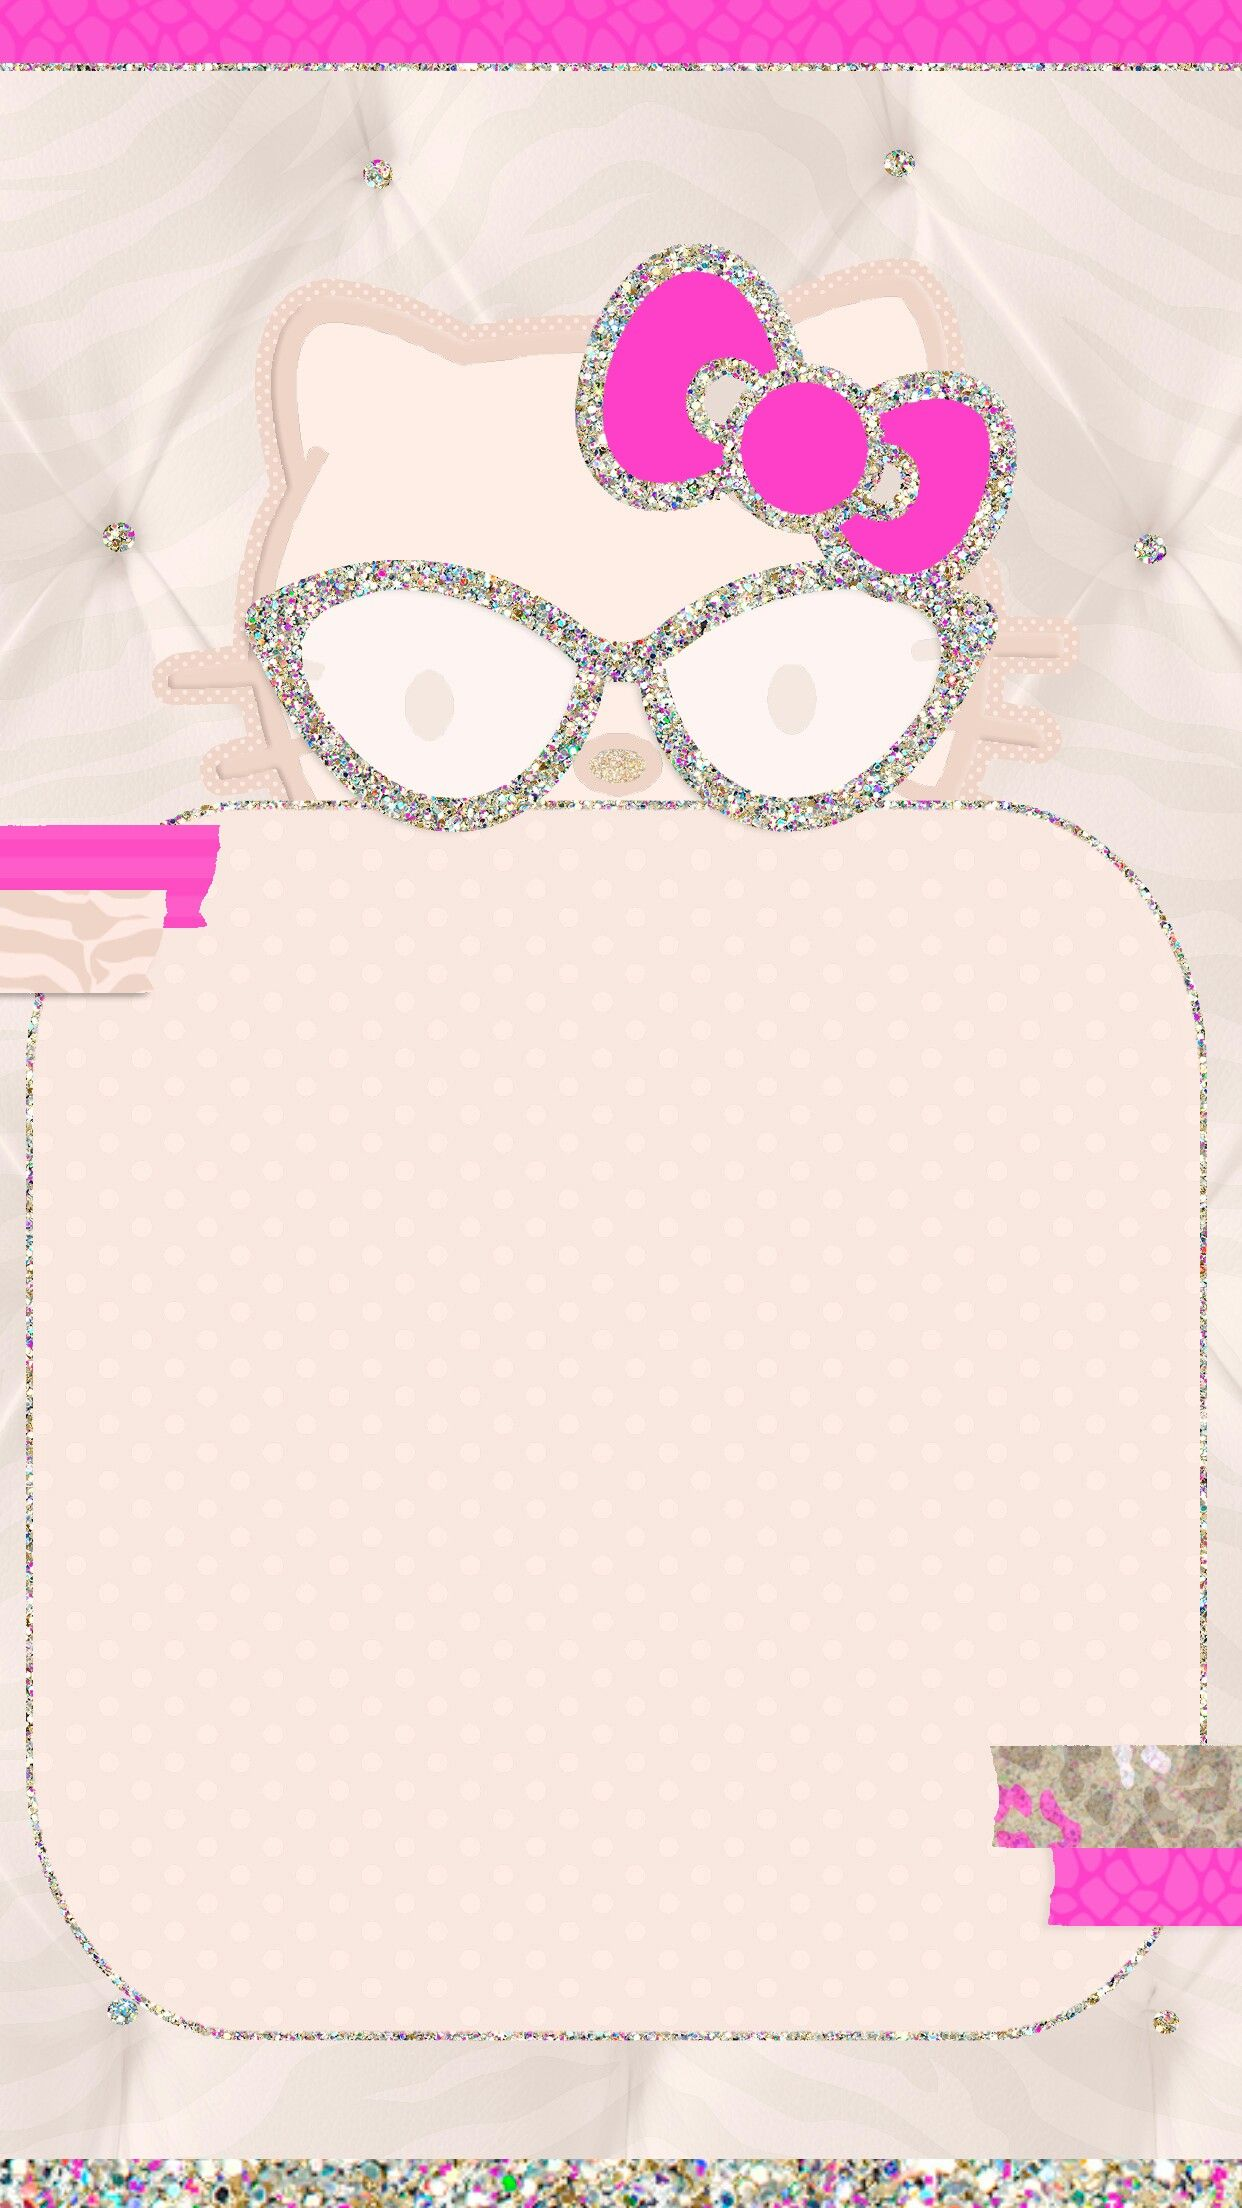 Download Wallpaper Hello Kitty Wall - 16c4ce58bd61db73bd39487f7f7e9ac1  Snapshot_869573.jpg